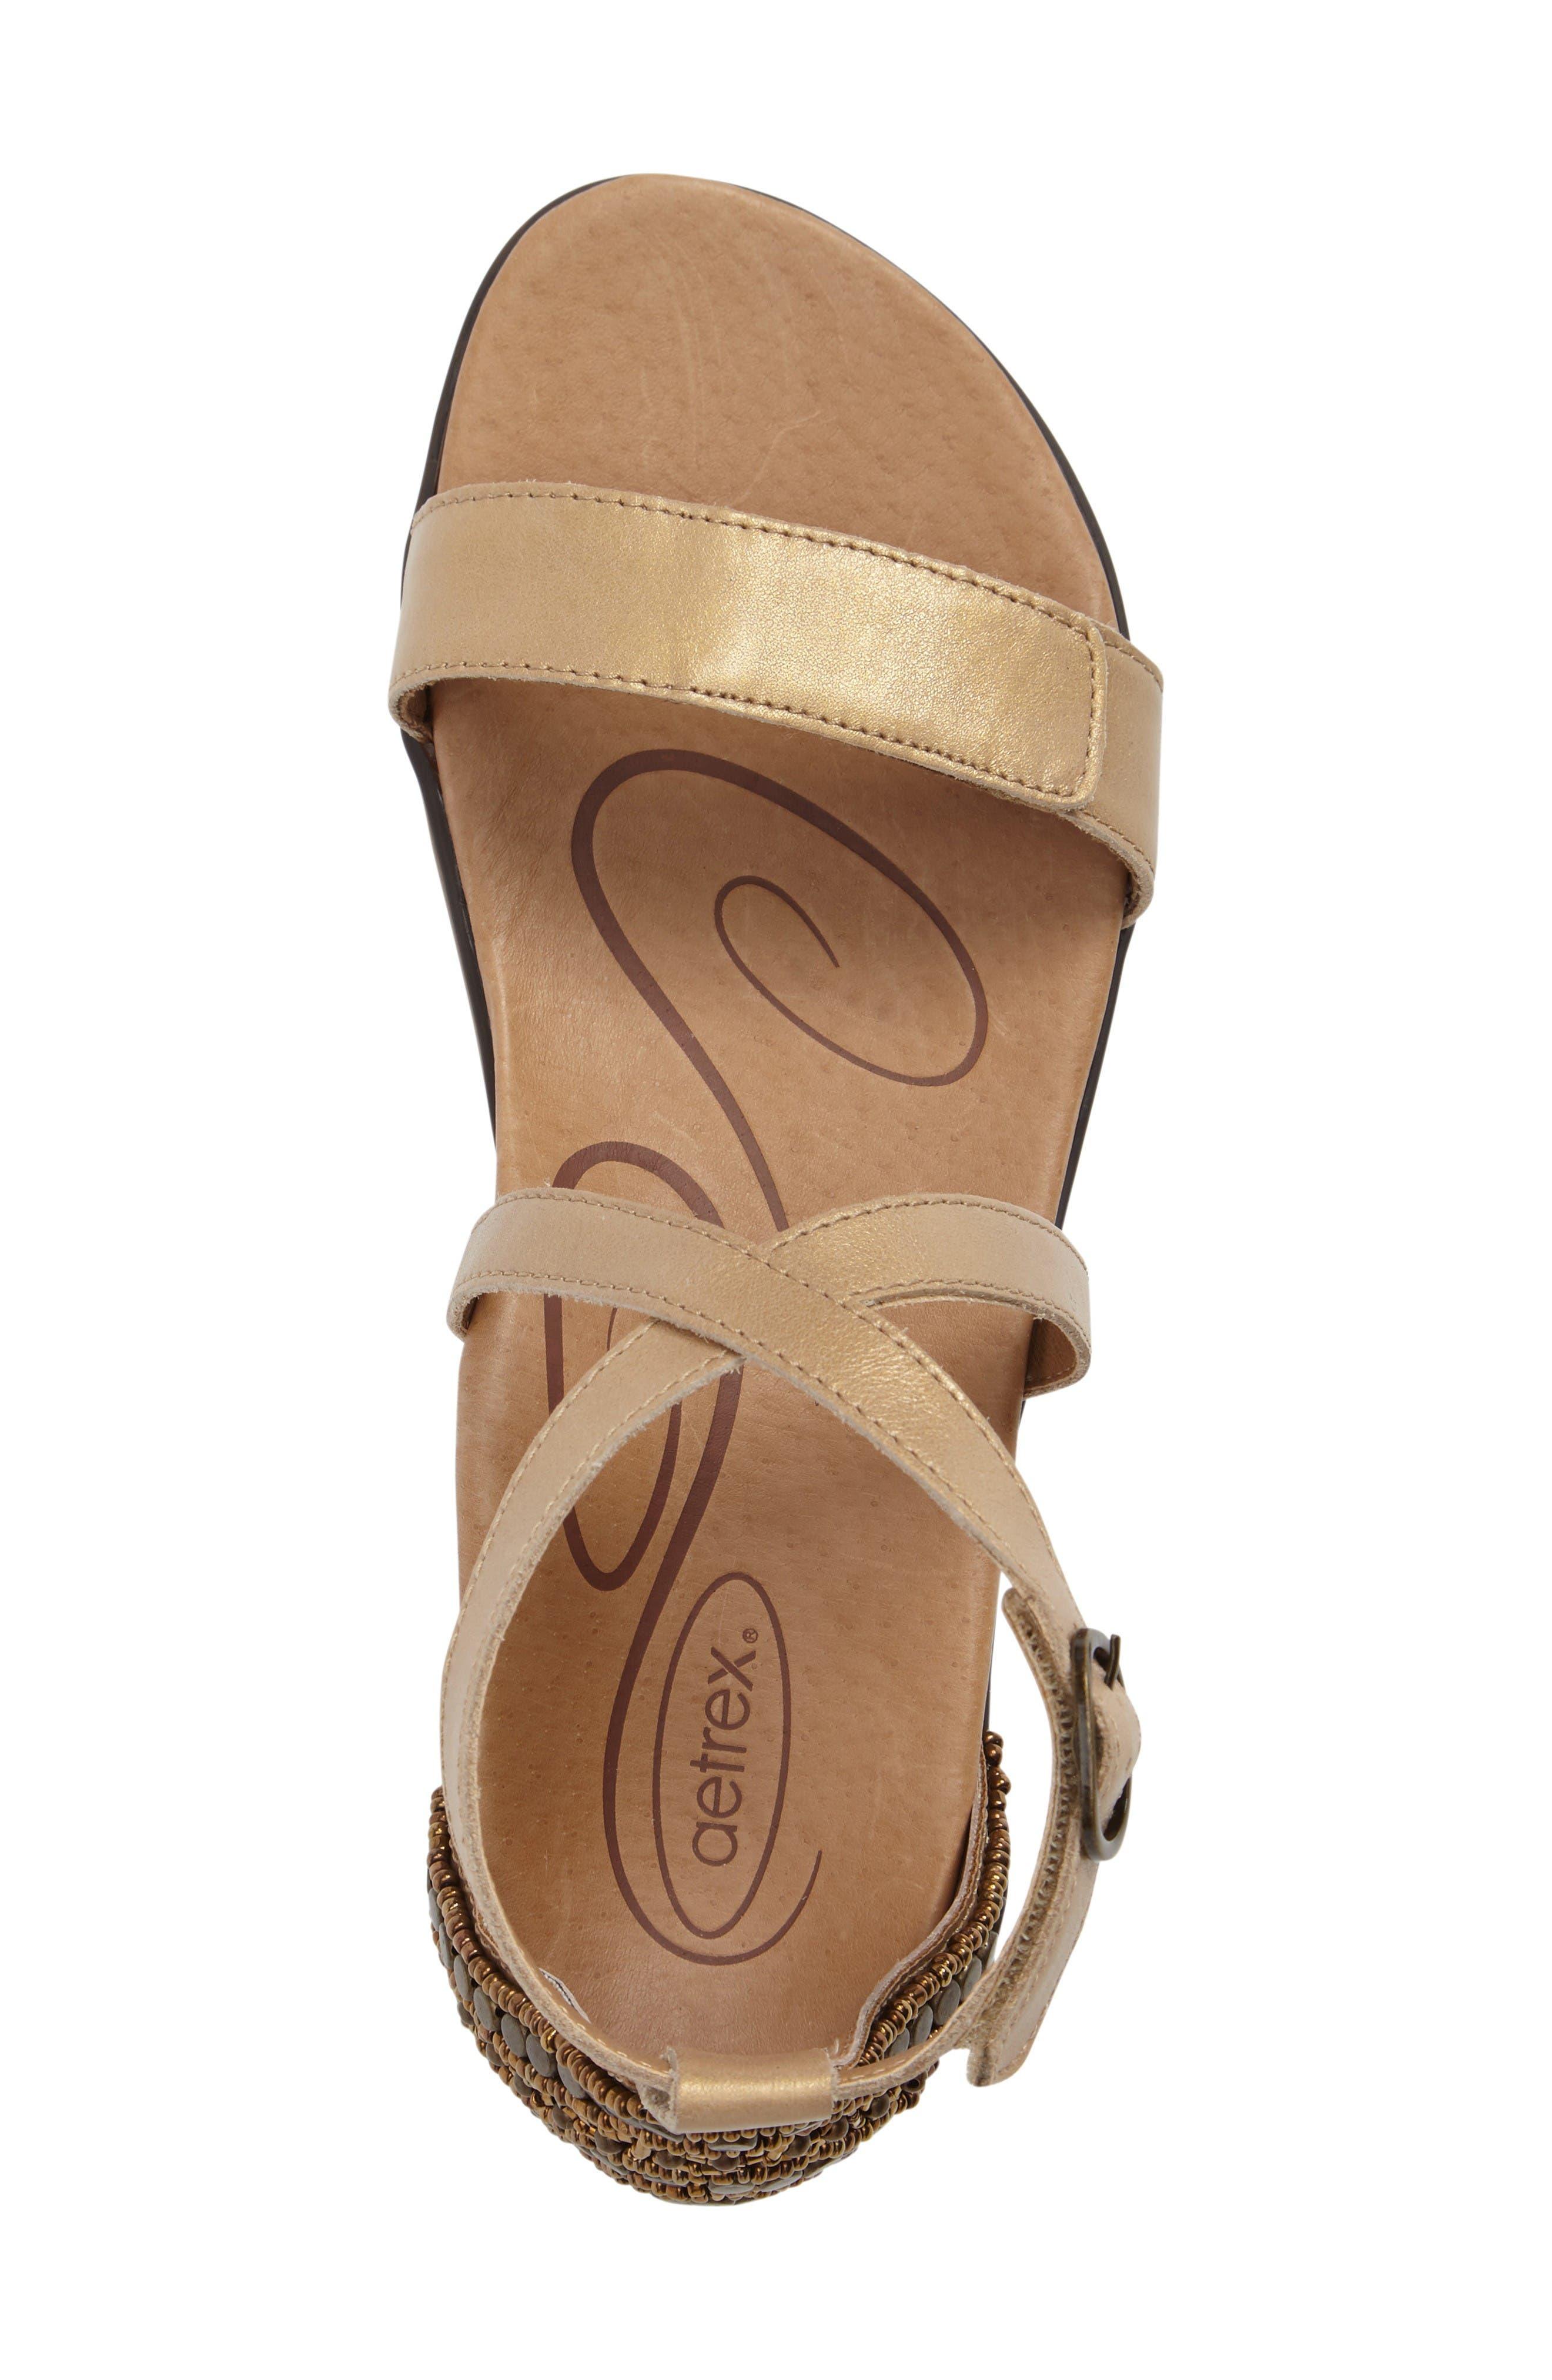 Brenda Embellished Cross Strap Sandal,                             Alternate thumbnail 5, color,                             Stone Leather